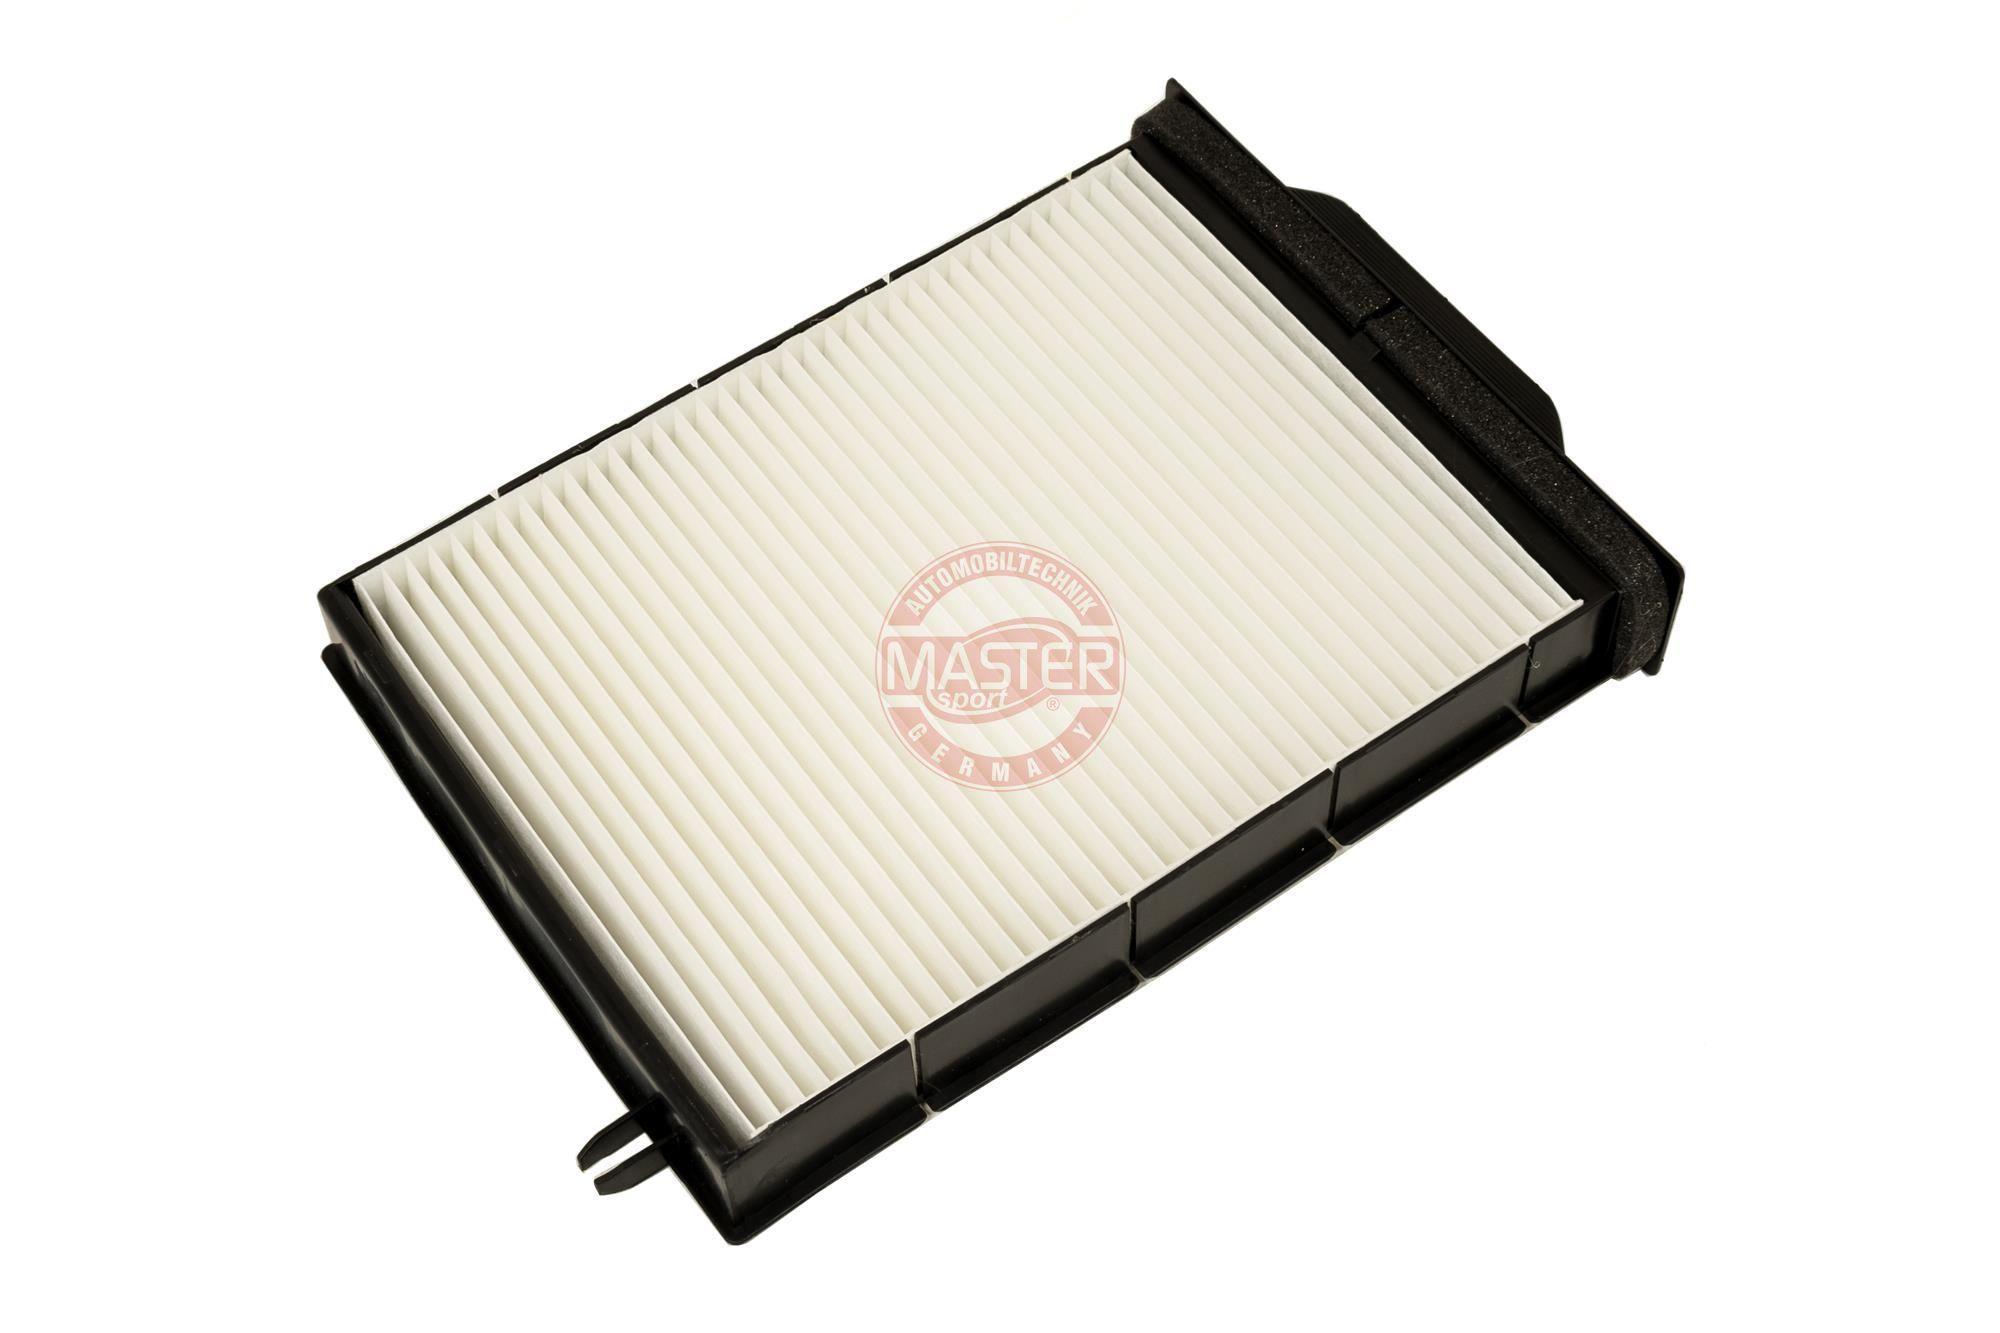 Innenraumfilter 2316-IF-PCS-MS MASTER-SPORT 420023160 in Original Qualität